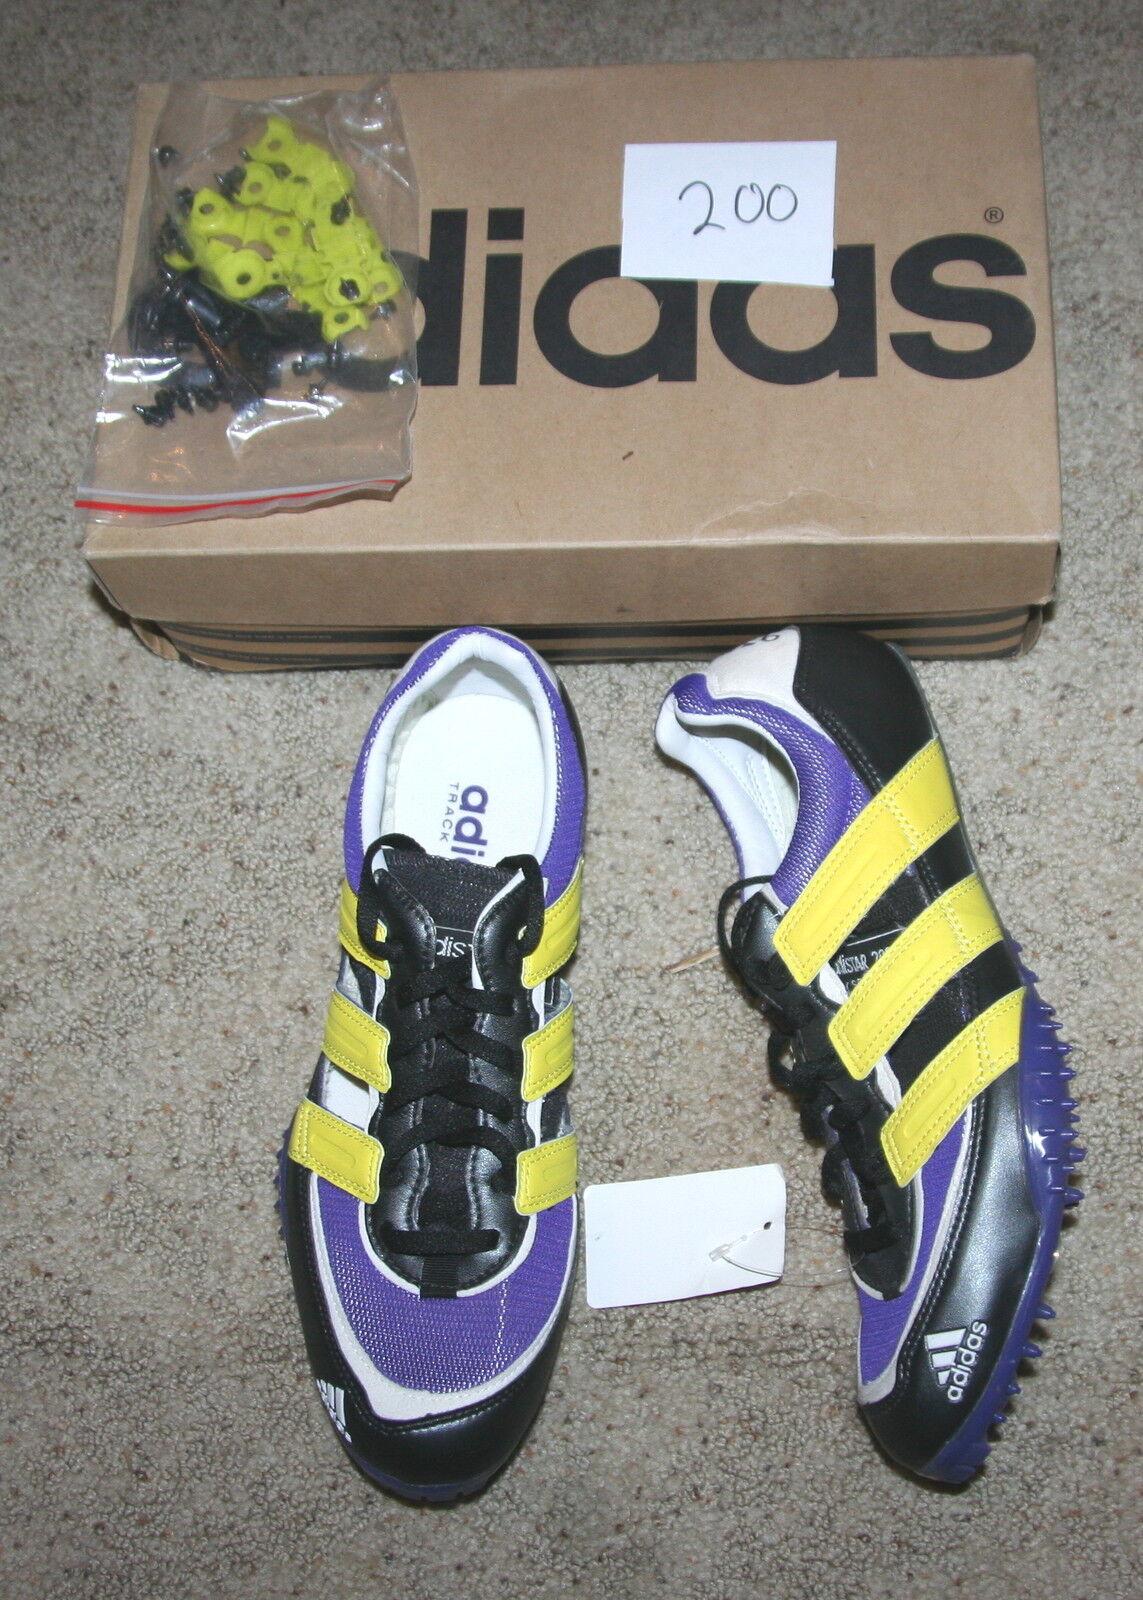 ADIDAS ADISTAR 2000 SP track field spikes MID DISTANCE shoe purple black Price reduction Seasonal clearance sale